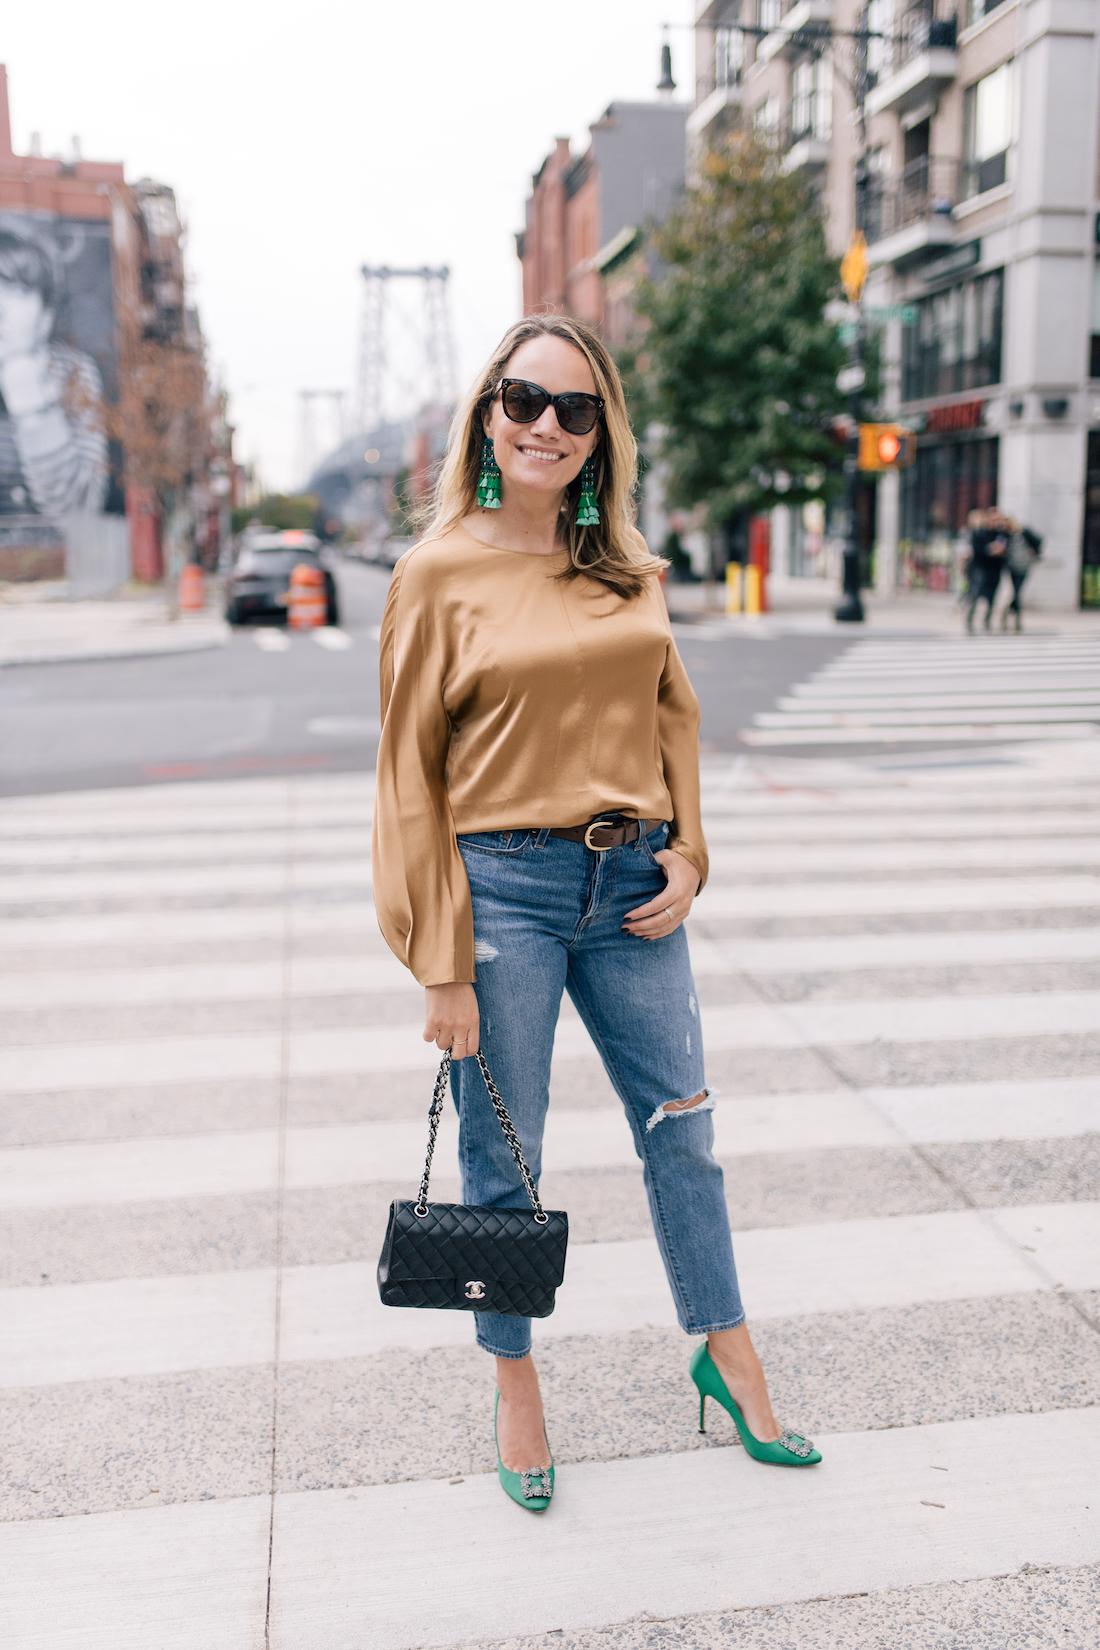 Outfit Details:Levi's Jeans //Vince Blouse  //Tuckernuck Earrings//Manolo Blahnik Heels //Polaroid Sunglasses //J.Crew Belt //Chanel Purse